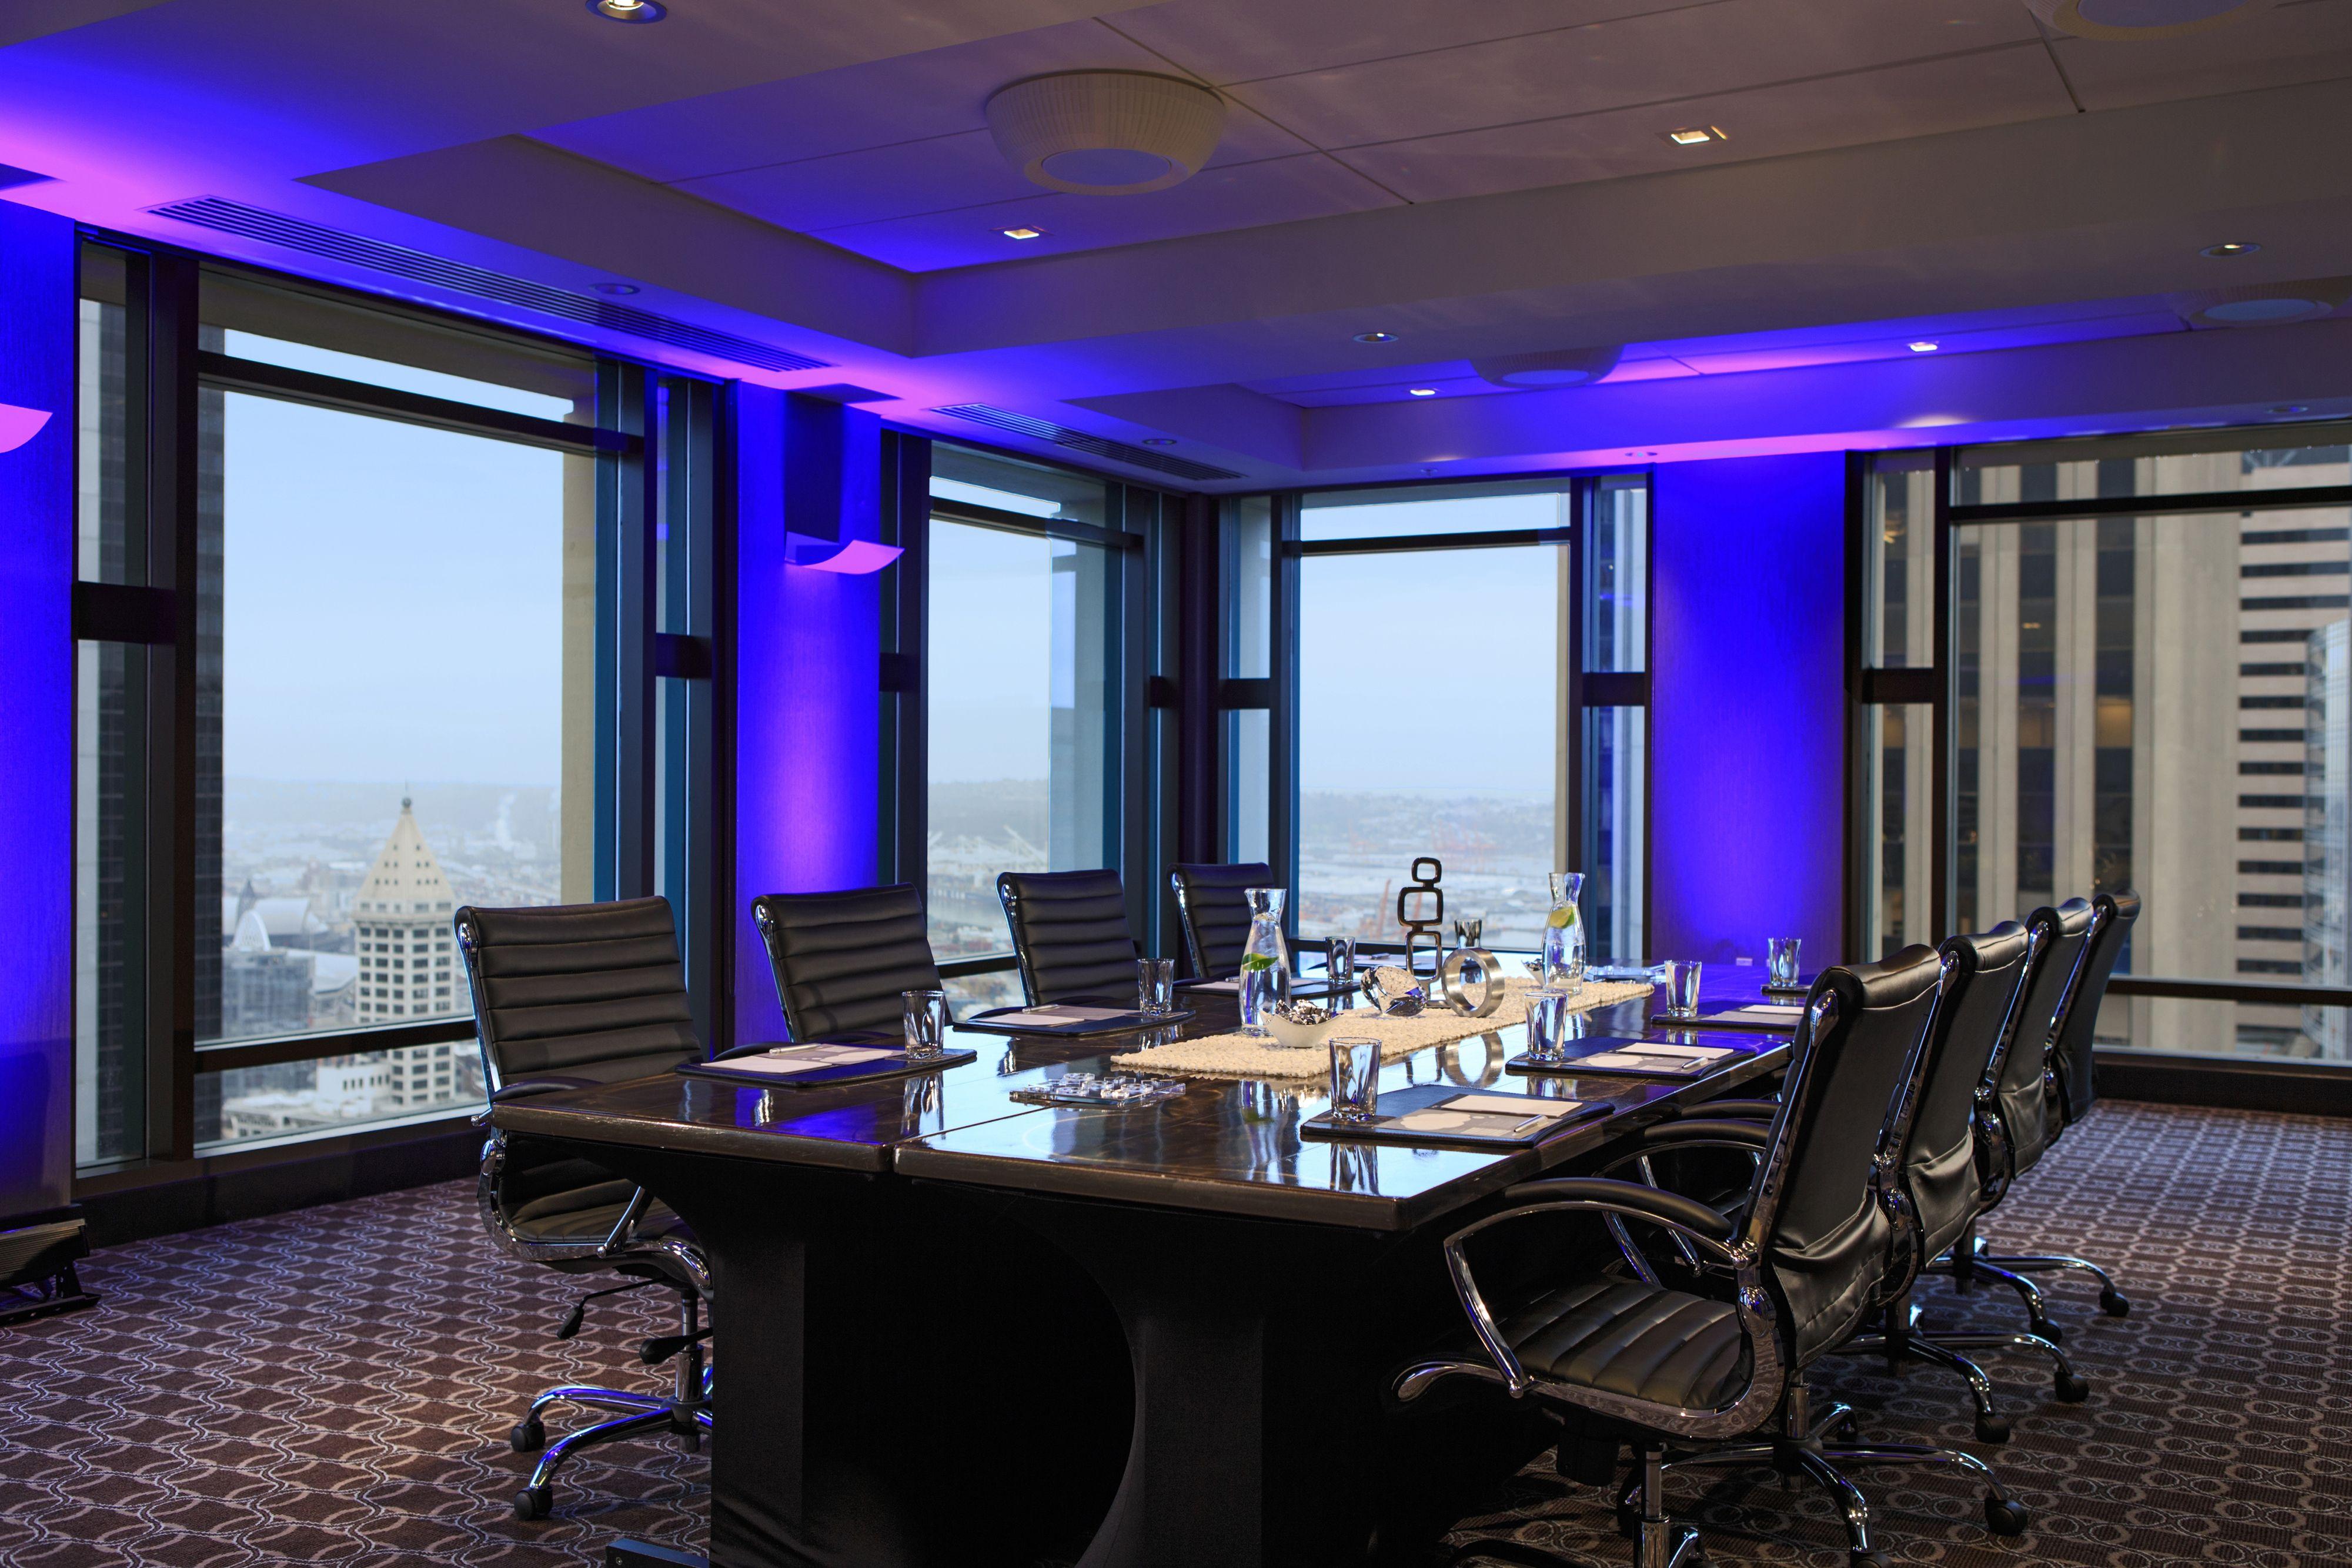 Vista - Meeting Room at Renaissance Seattle Hotel | Renaissance ...